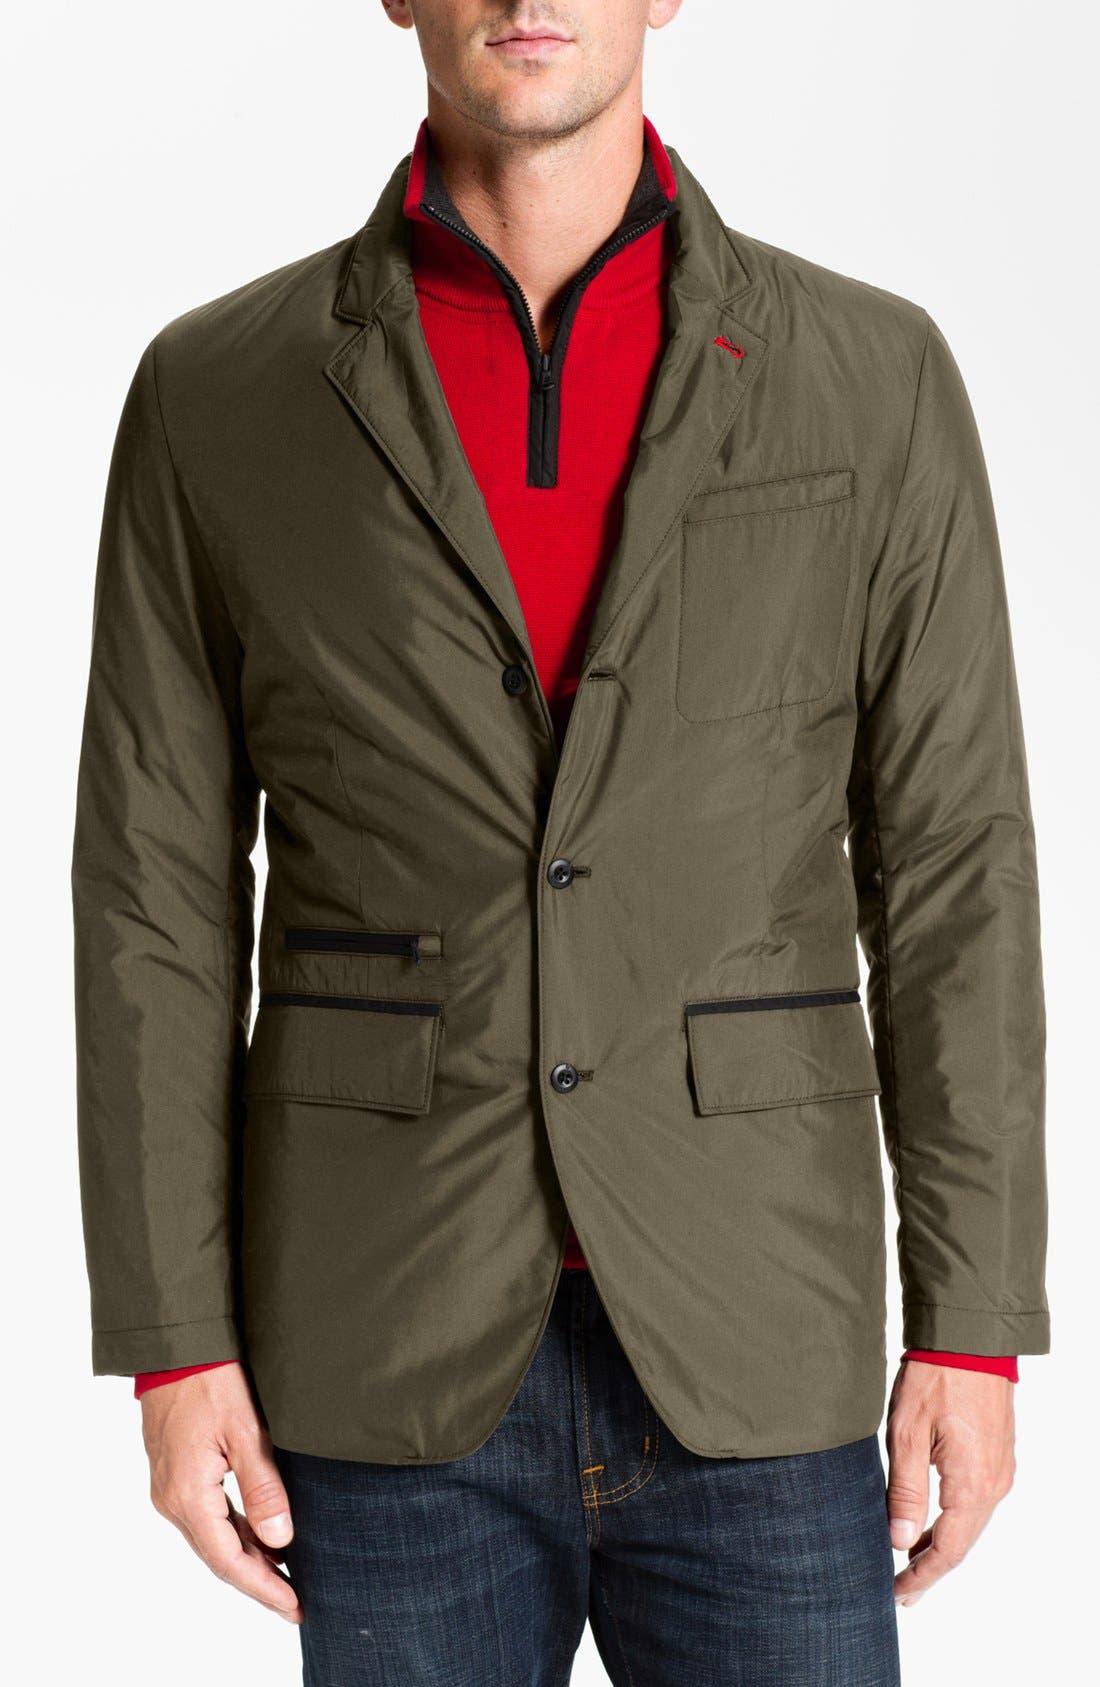 Alternate Image 1 Selected - Victorinox Swiss Army® 'Leiden' Regular Fit Insulated Blazer